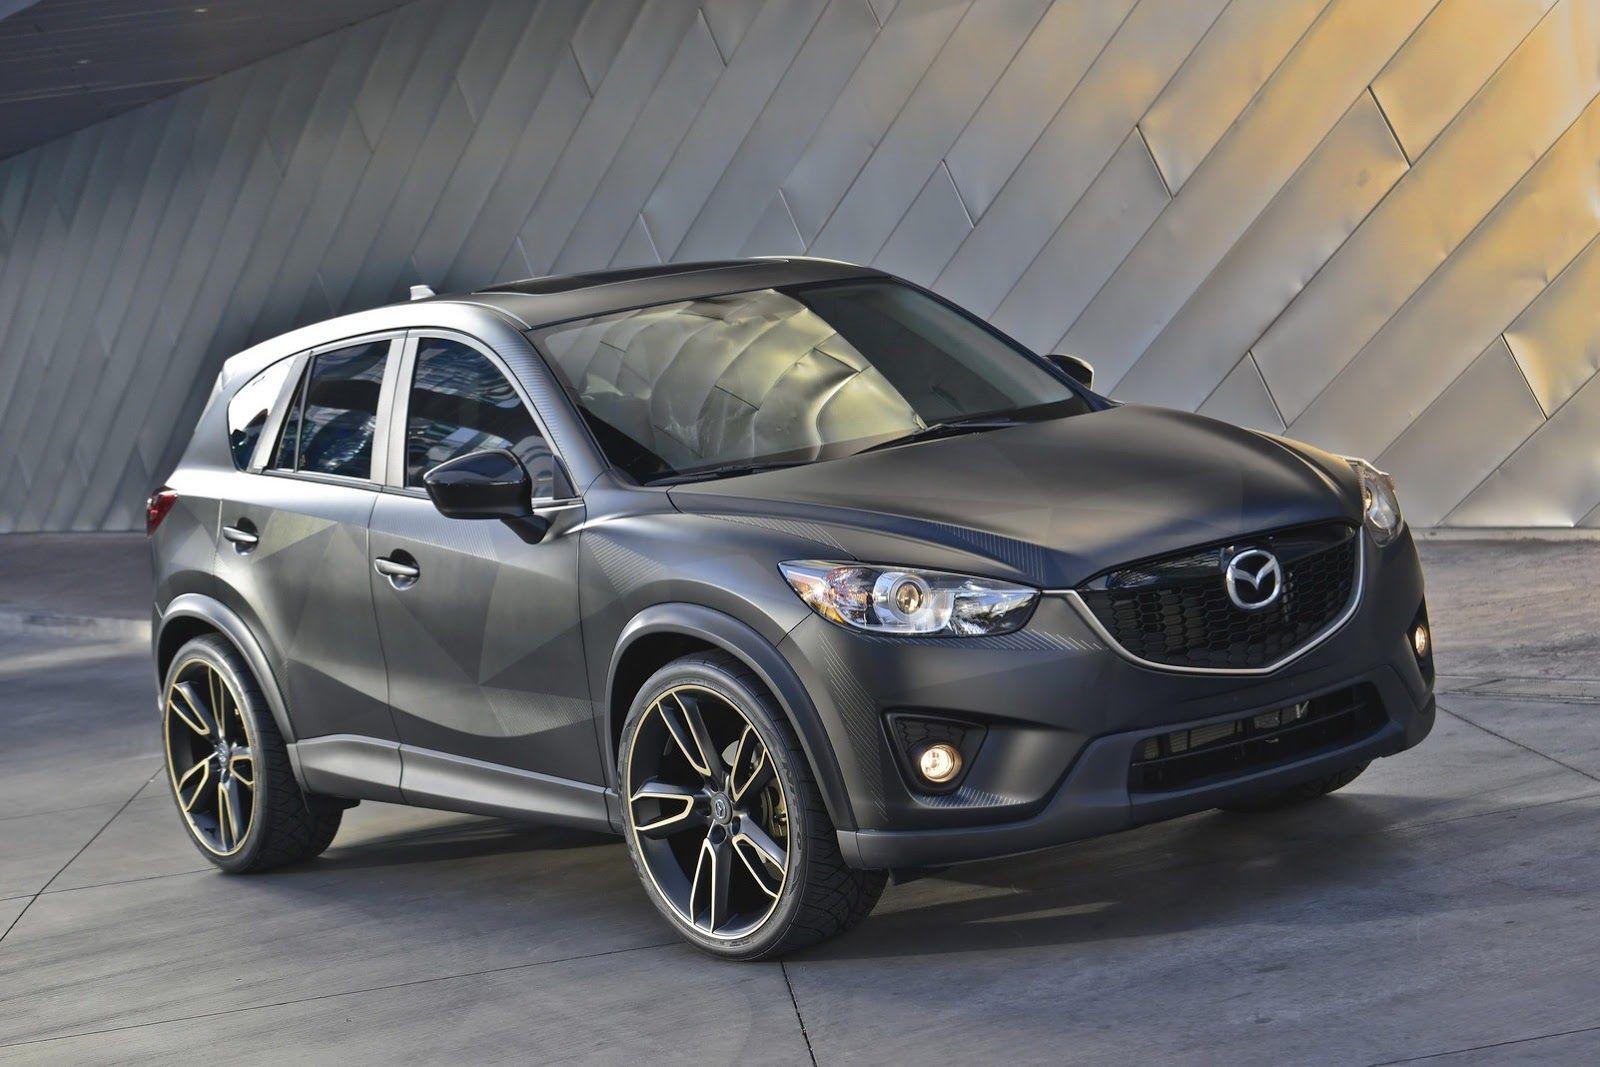 2015 Mazda CX-5 HD Wallpaper - http://carwallspaper.com/2015-mazda-cx-5-hd-wallpaper-2/